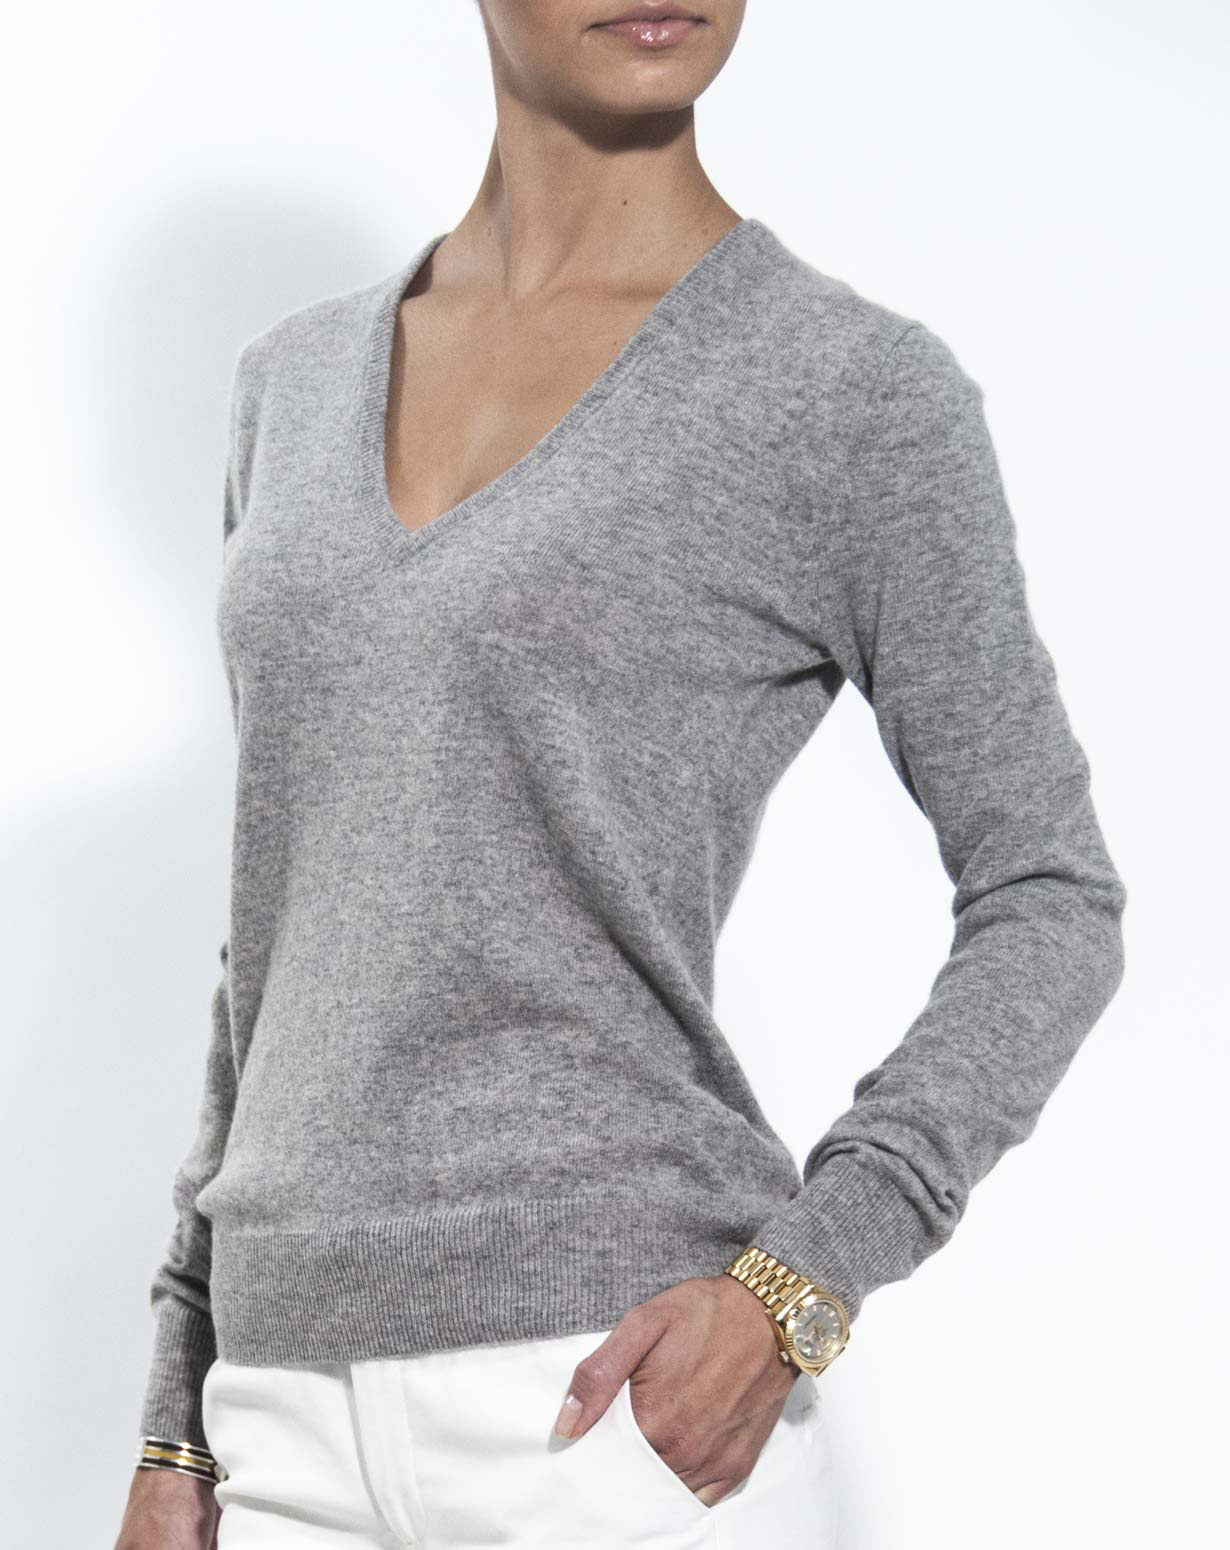 cashmere jumpers ladiesu0027 pure cashmere v-neck jumper mhanure